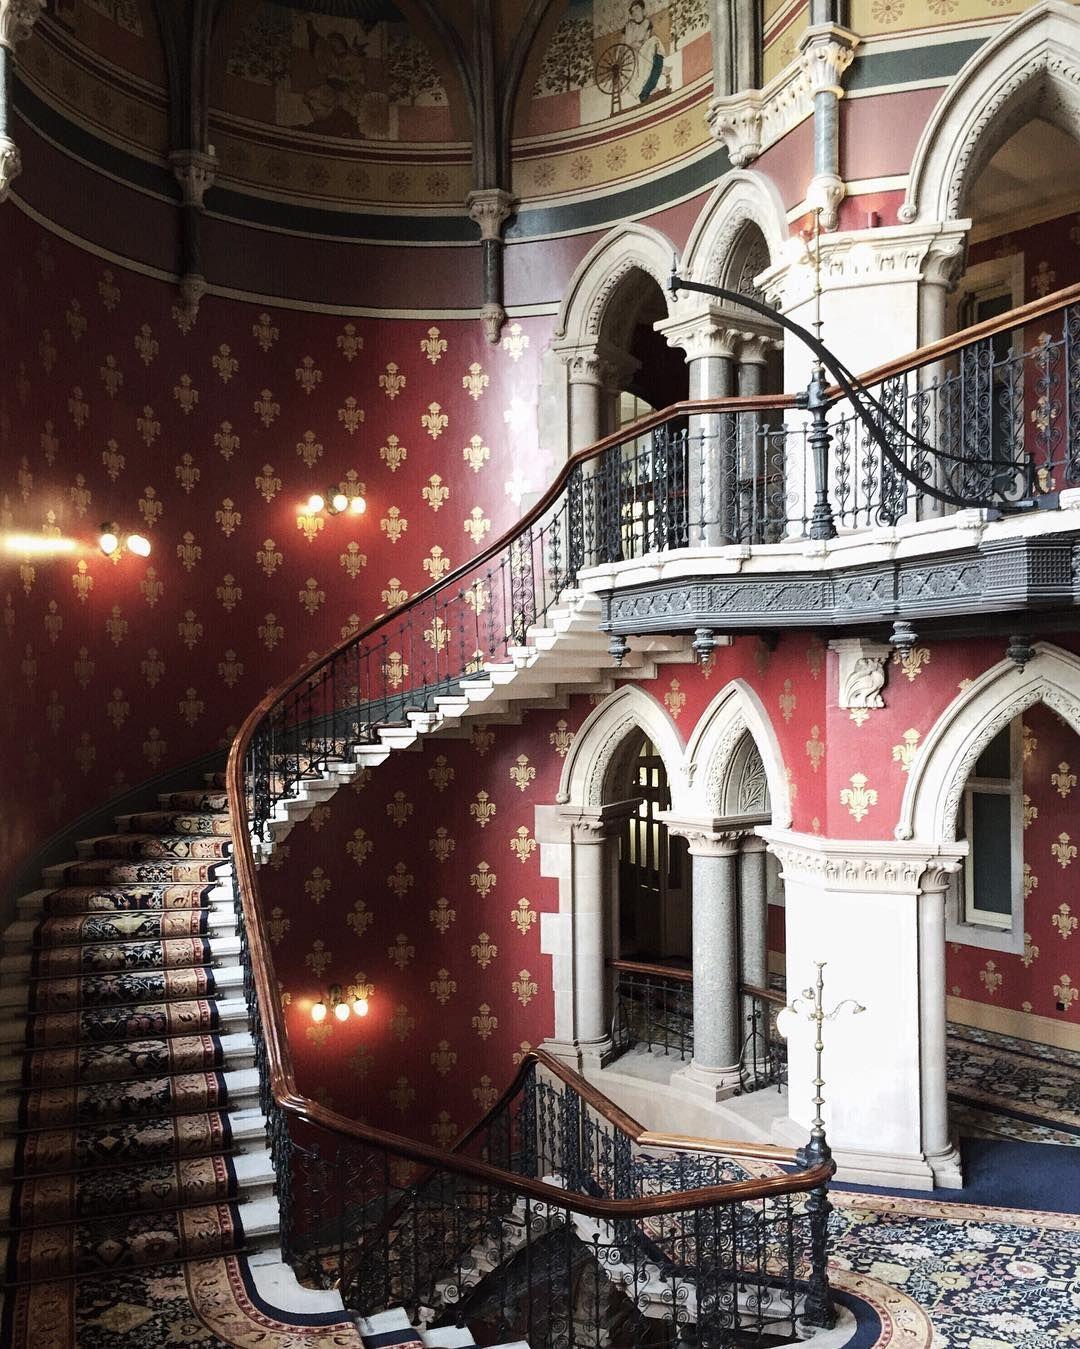 St Pancras Renaissance Hotel London Euston Road Nw1 2ar